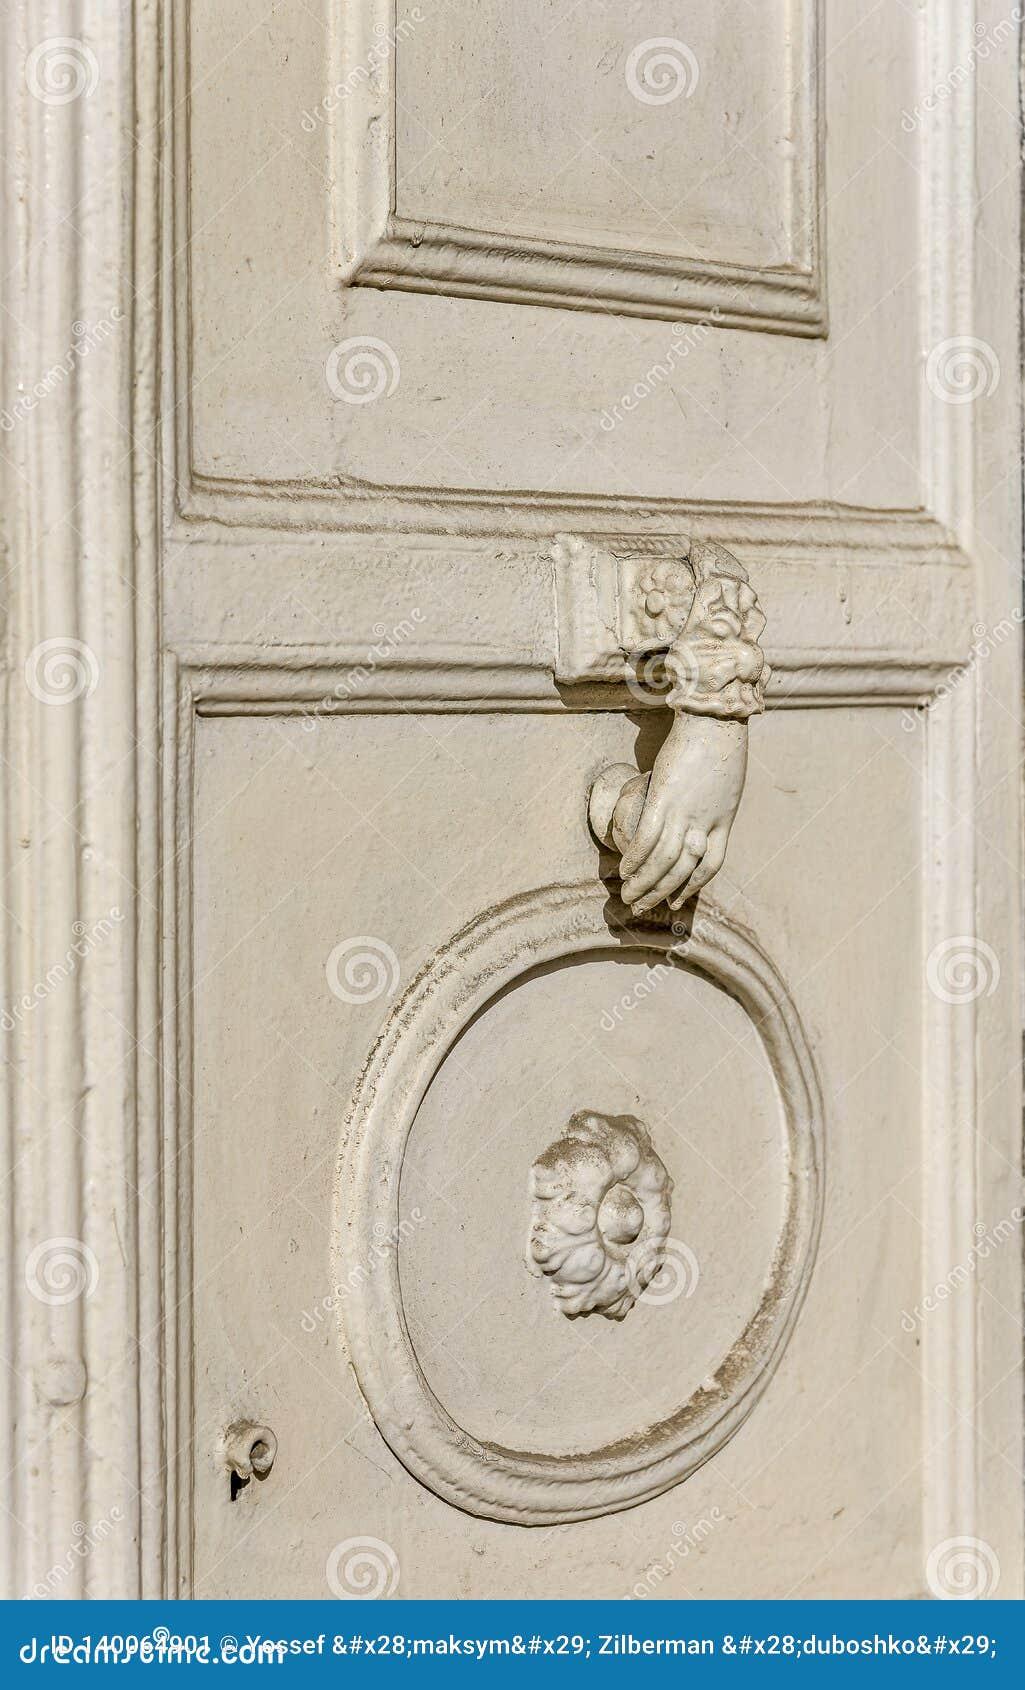 Old Palace White Wooden Door And White Metal Knocker Stock ... |White Door Knocker